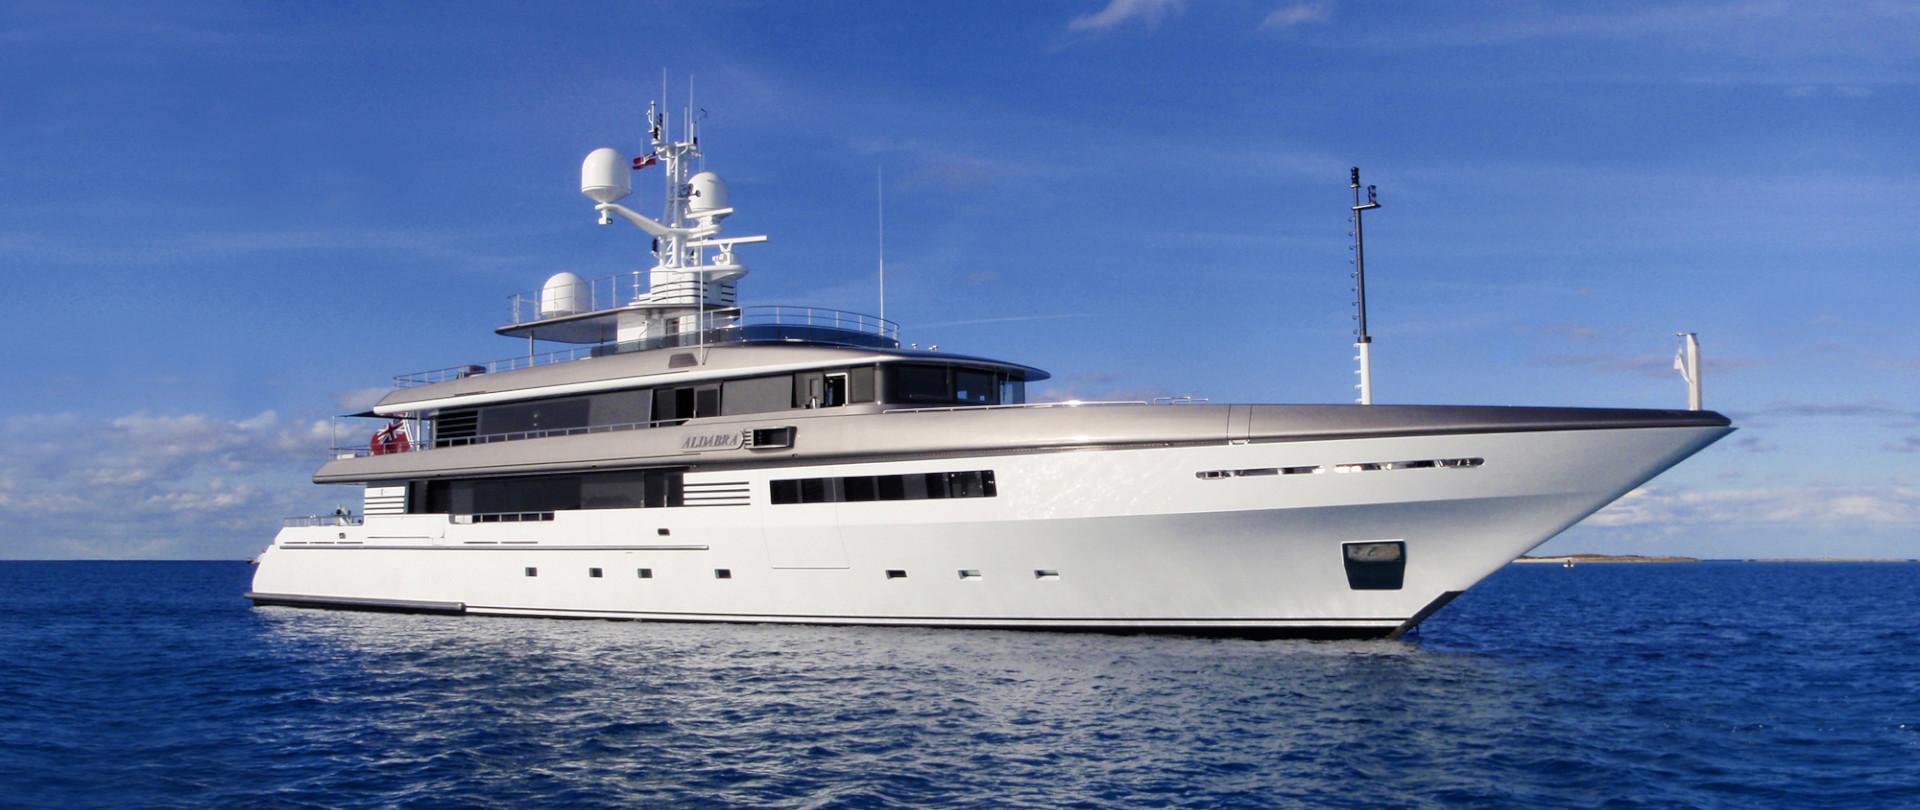 ALDABRA, attending Yachts Miami Beach photo 1